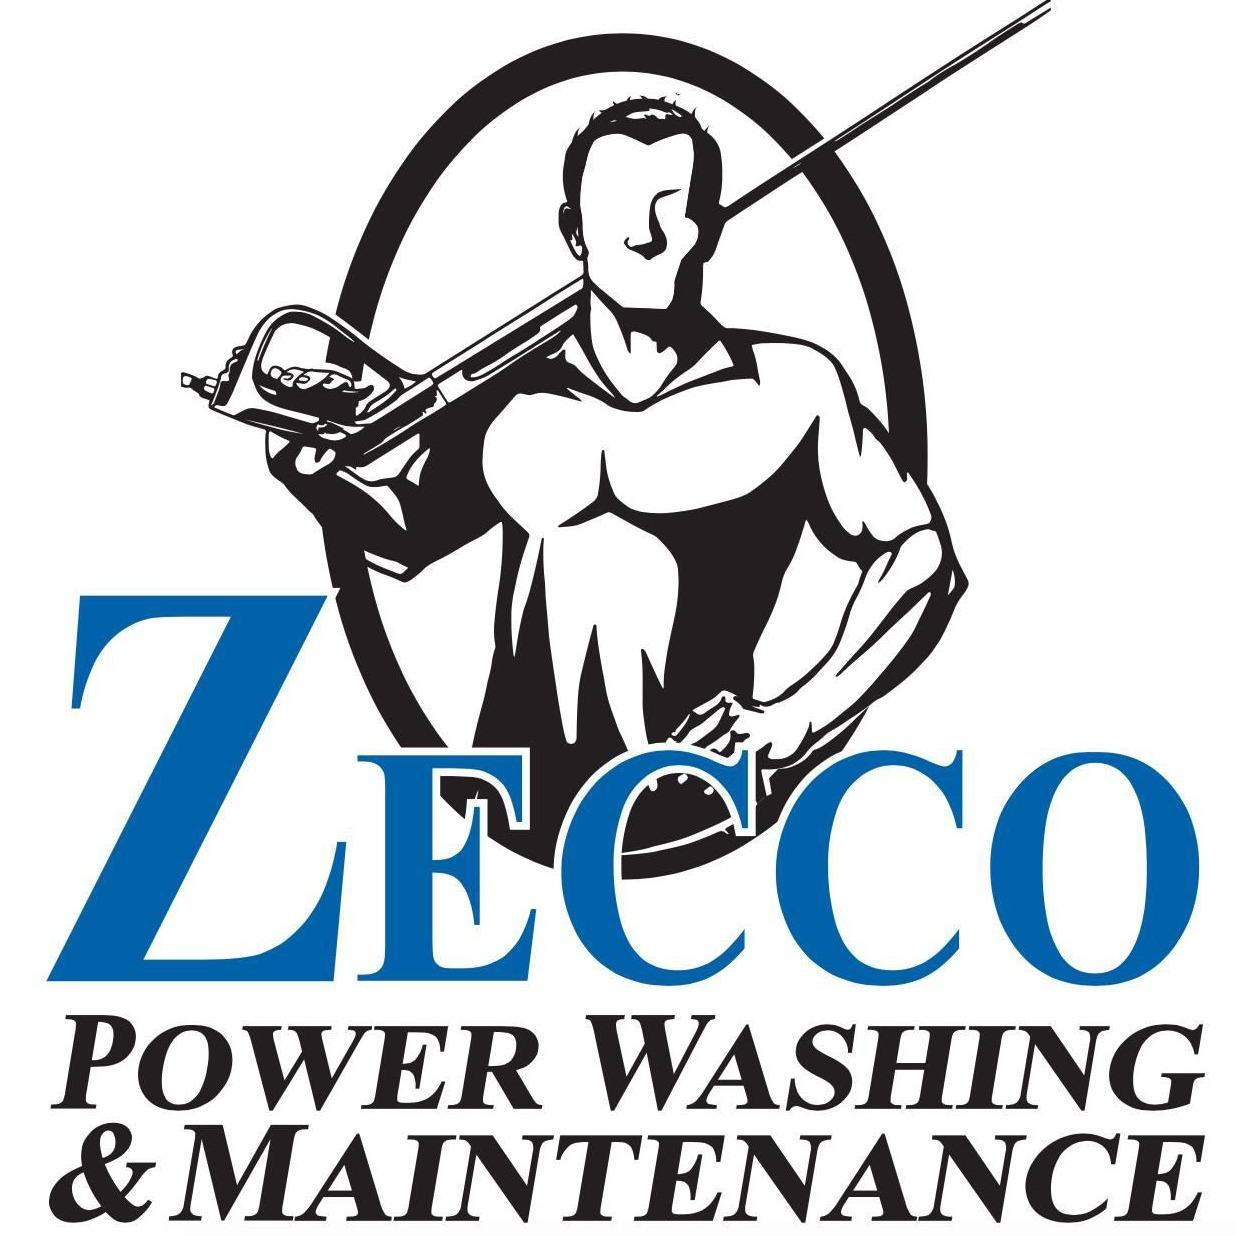 Zecco Power Washing & Maintenance Logo